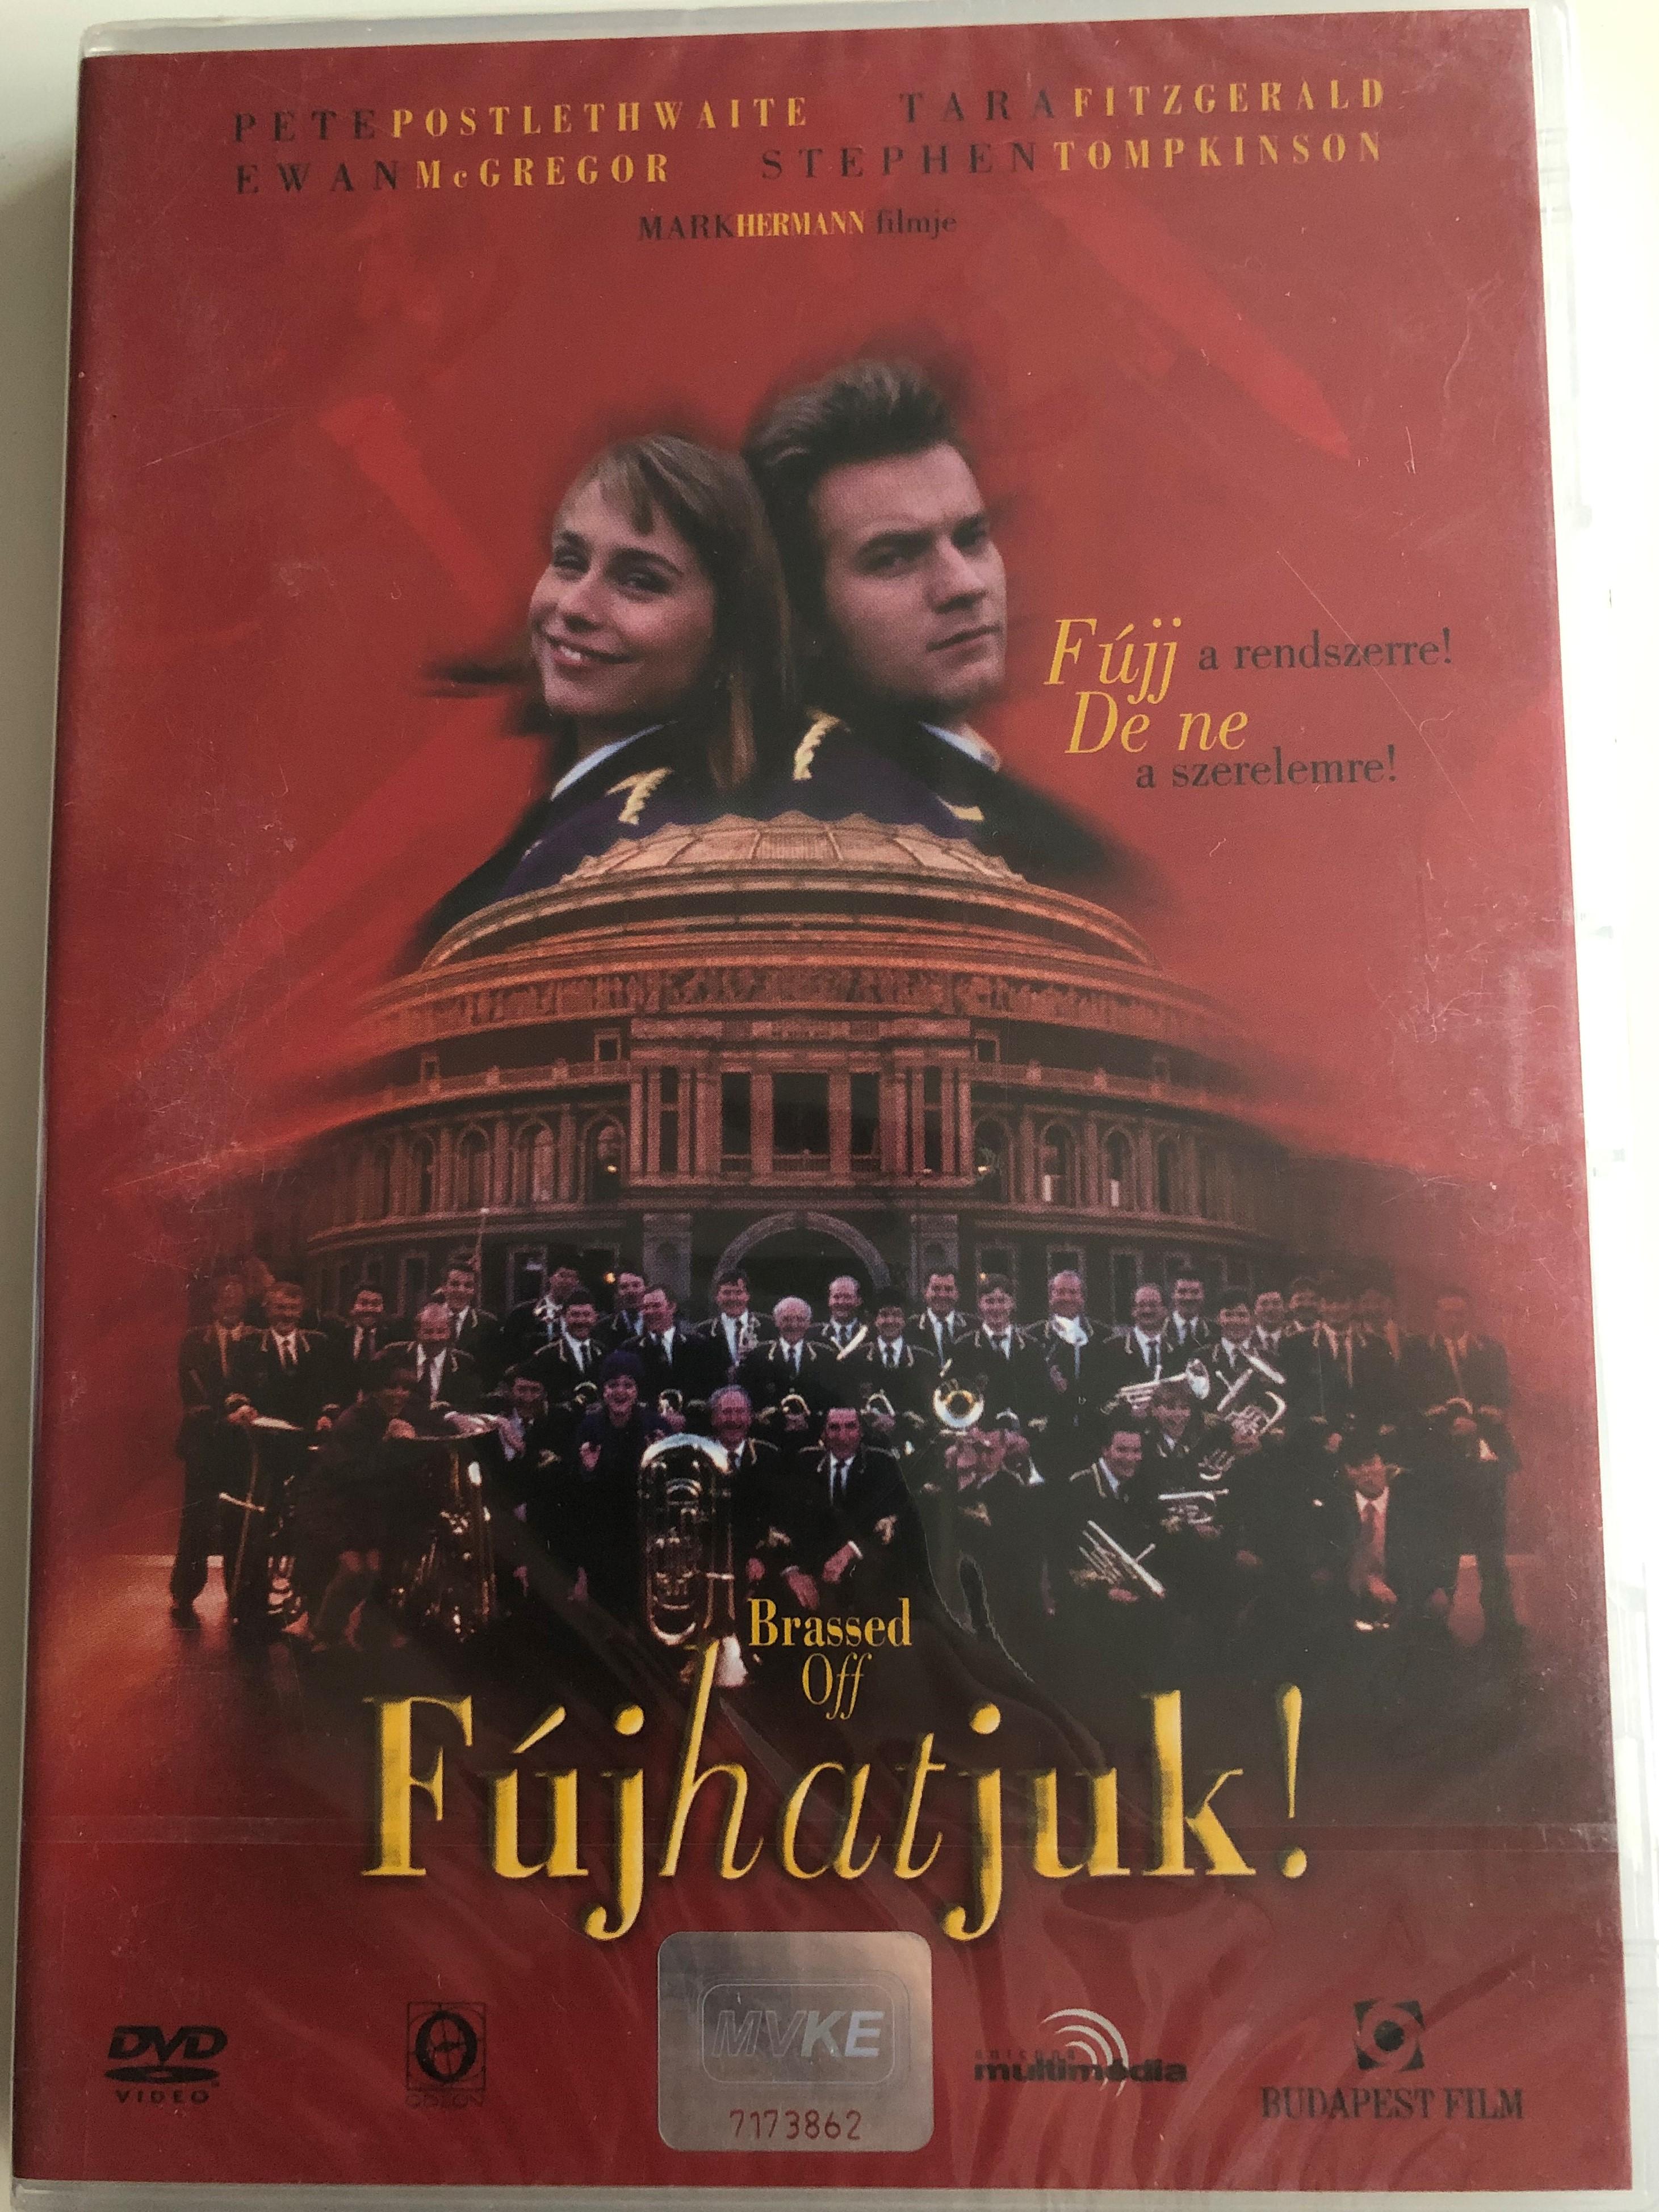 brassed-off-dvd-1996-f-jhatjuk-directed-by-mark-herman-1.jpg